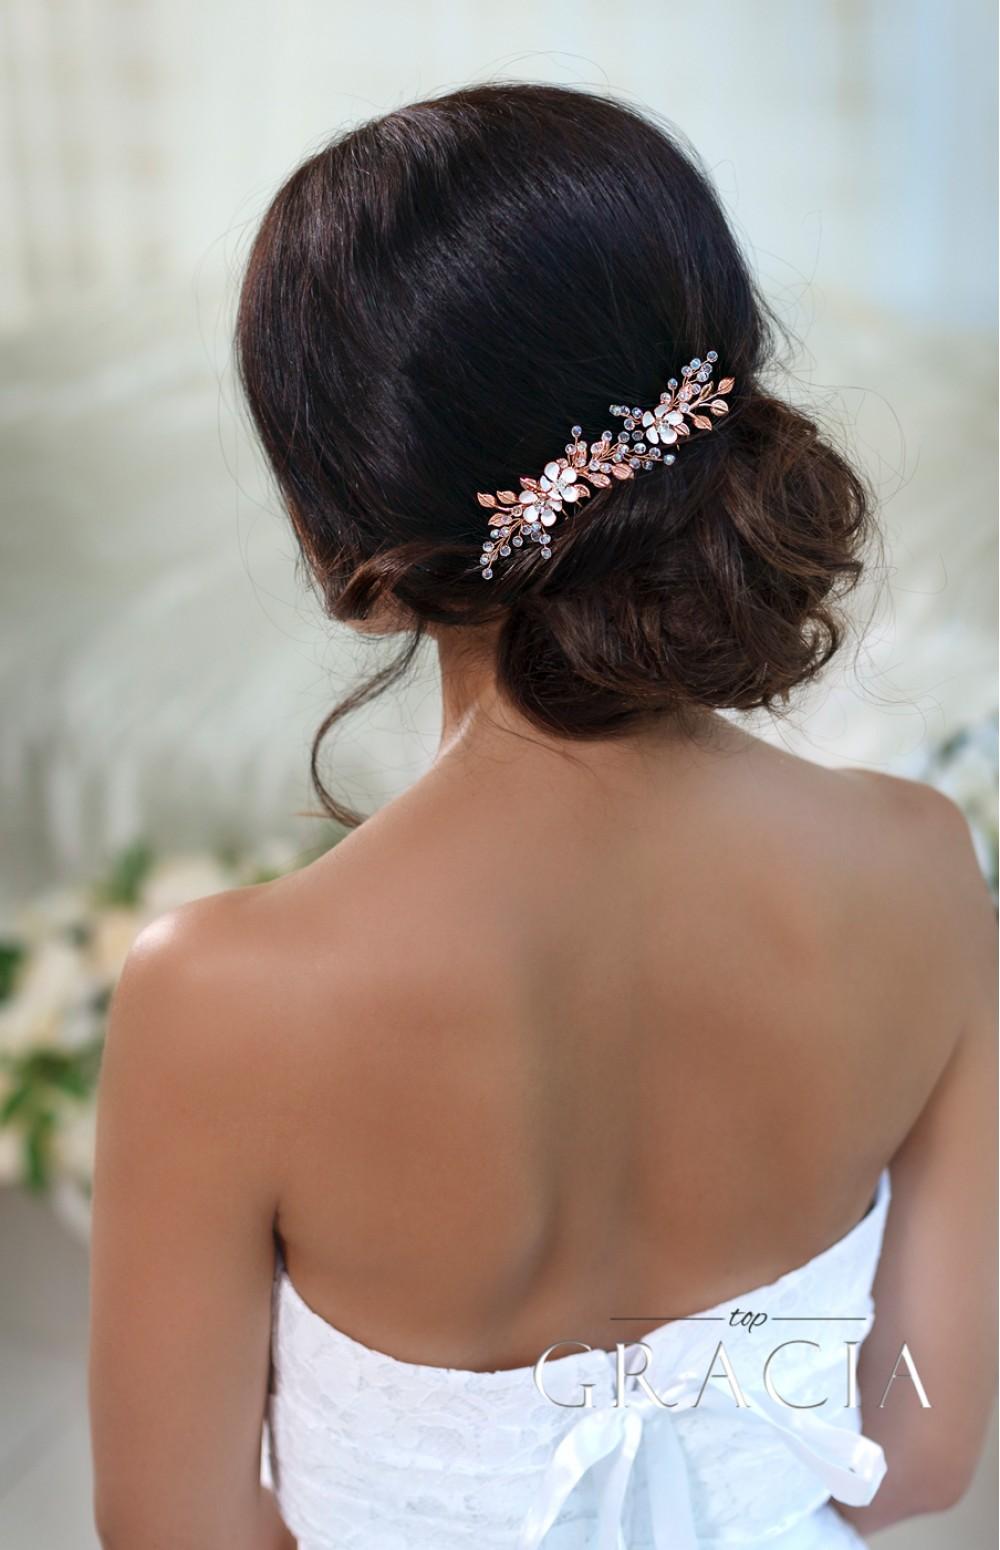 kassandra rose gold wedding hair accessories flower bridal hair pins by topgracia